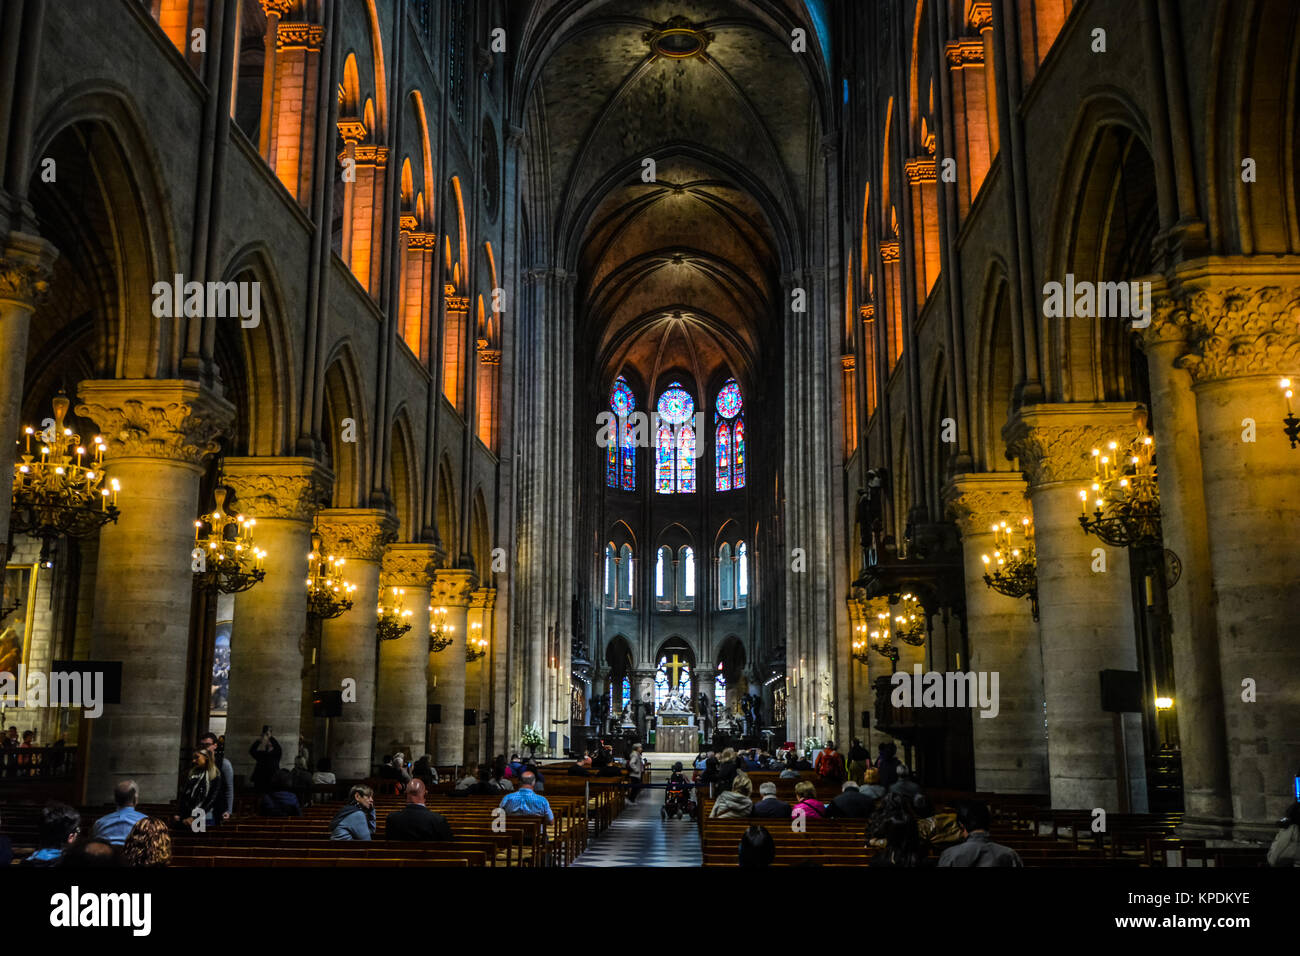 The gothic interor, nave and pews of the medieval cathedral, Notre Dame de Paris on the Ile de la Cite in Paris - Stock Image